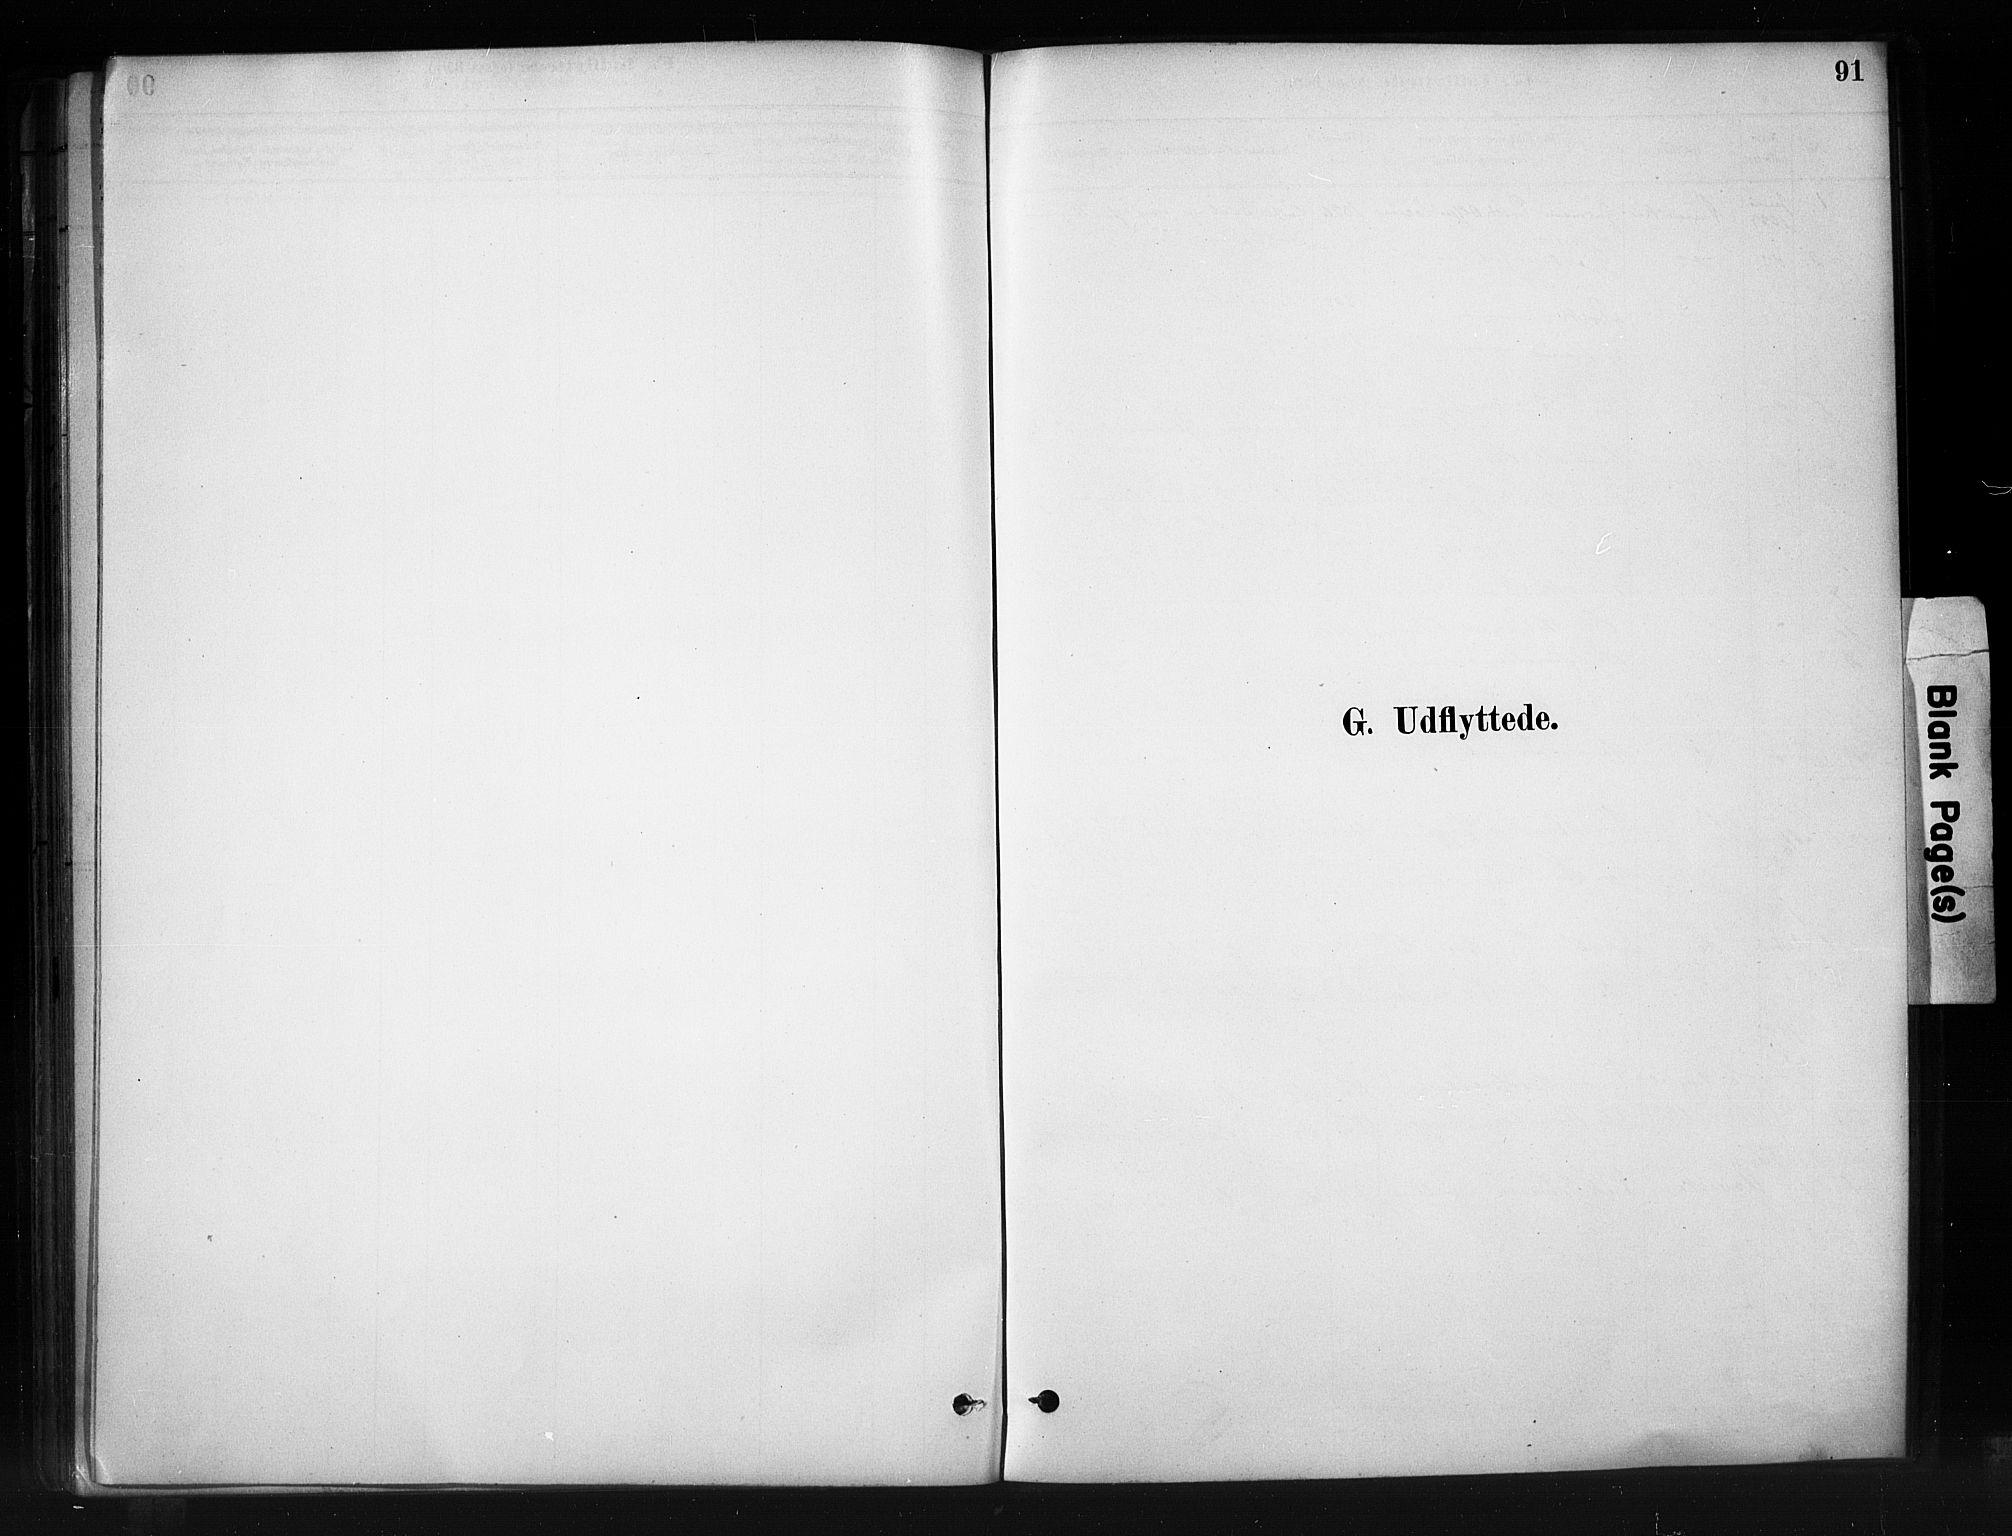 SAH, Nord-Aurdal prestekontor, Ministerialbok nr. 10, 1883-1896, s. 91